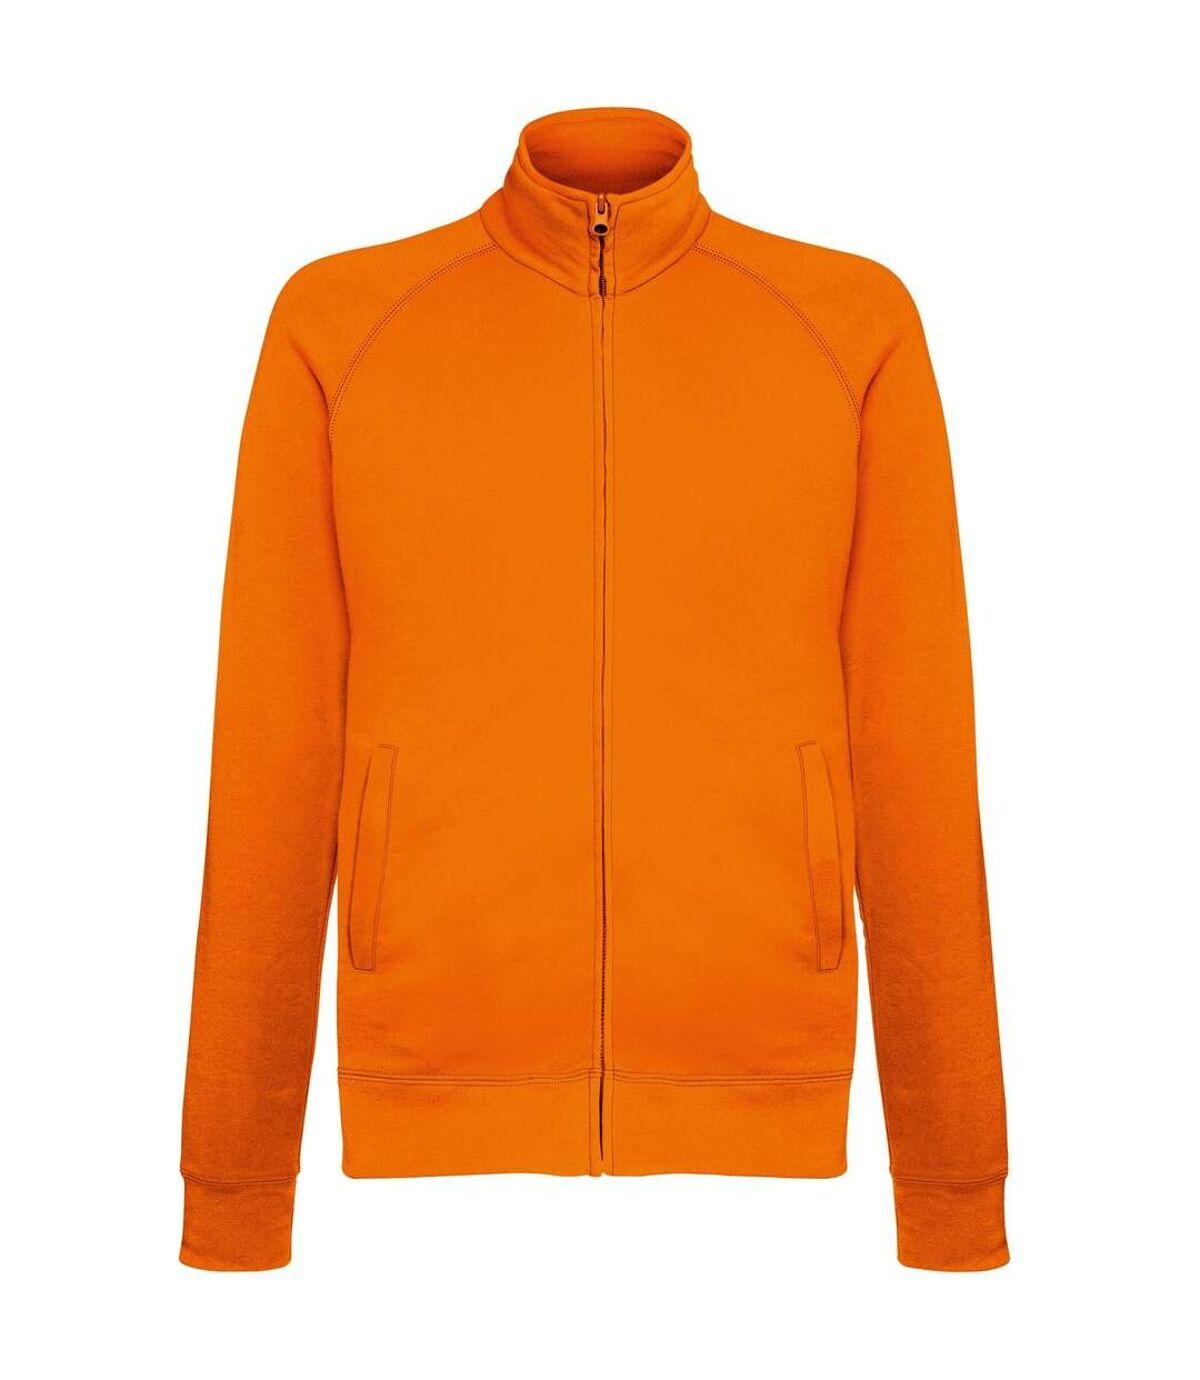 Fruit Of The Loom Mens Lightweight Full Zip Sweatshirt Jacket (Fuchsia) - UTRW4500